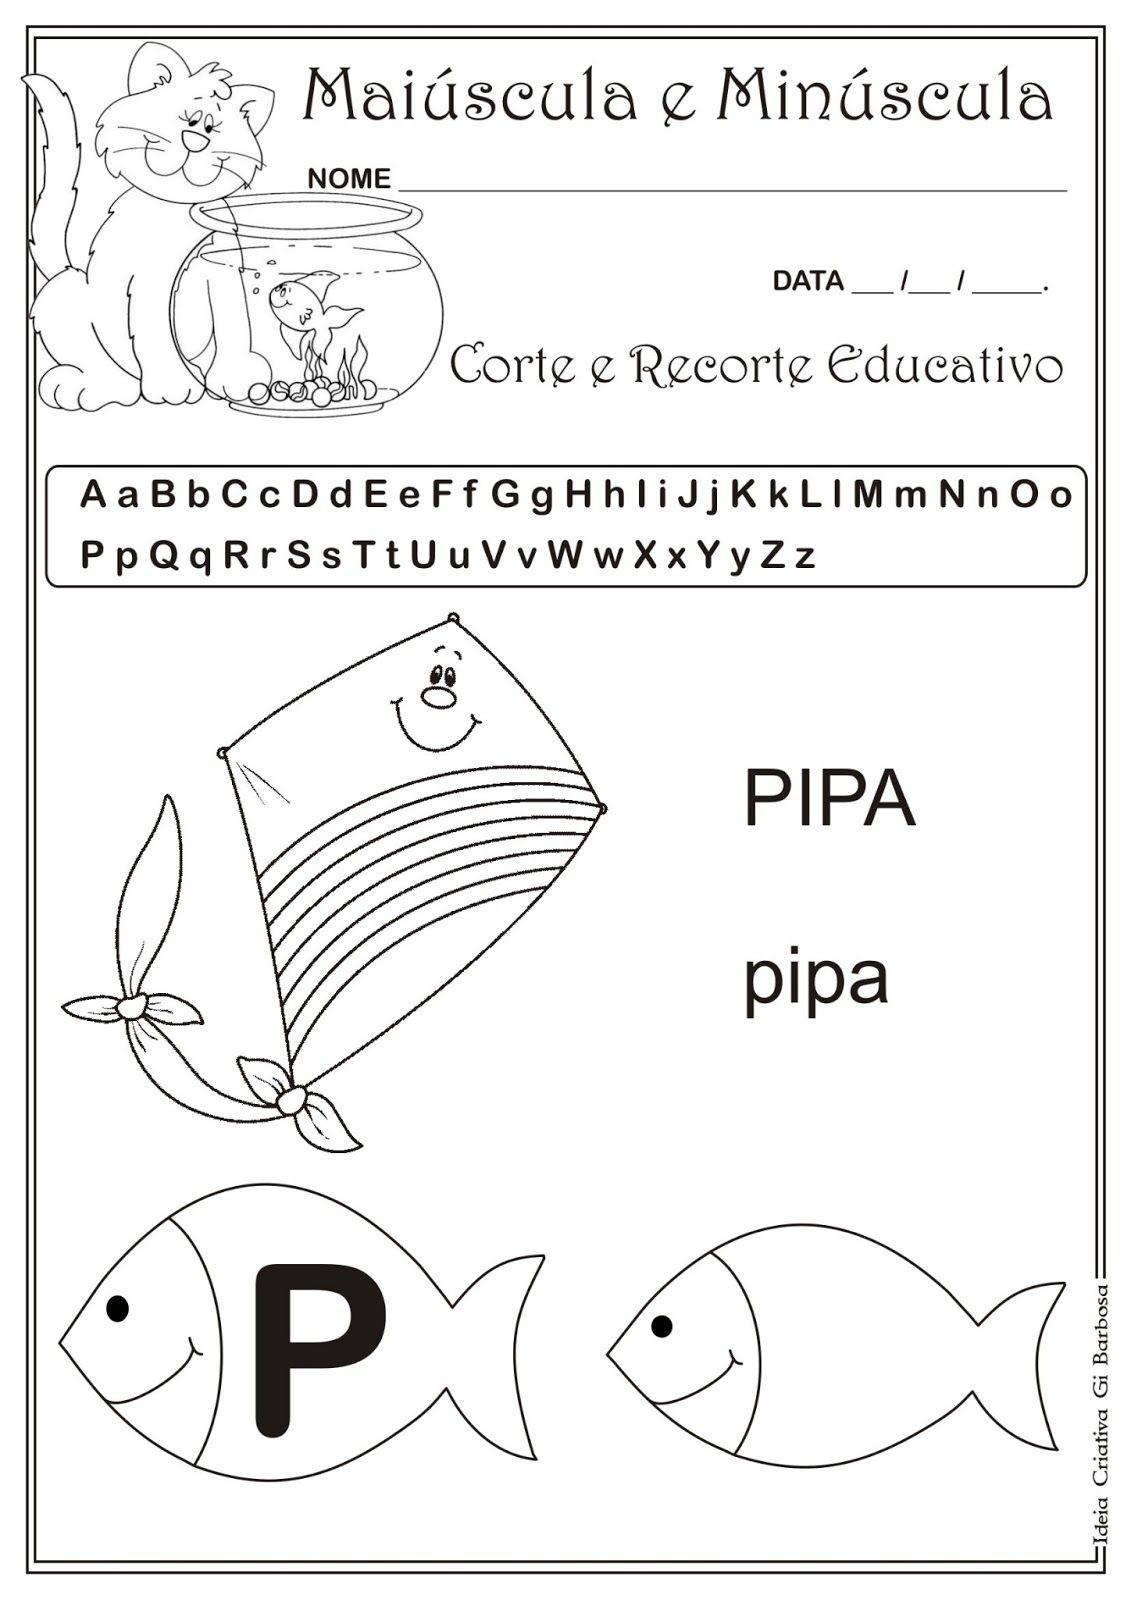 caderno de atividades gr c3 a1tis para imprimir corte e recorte